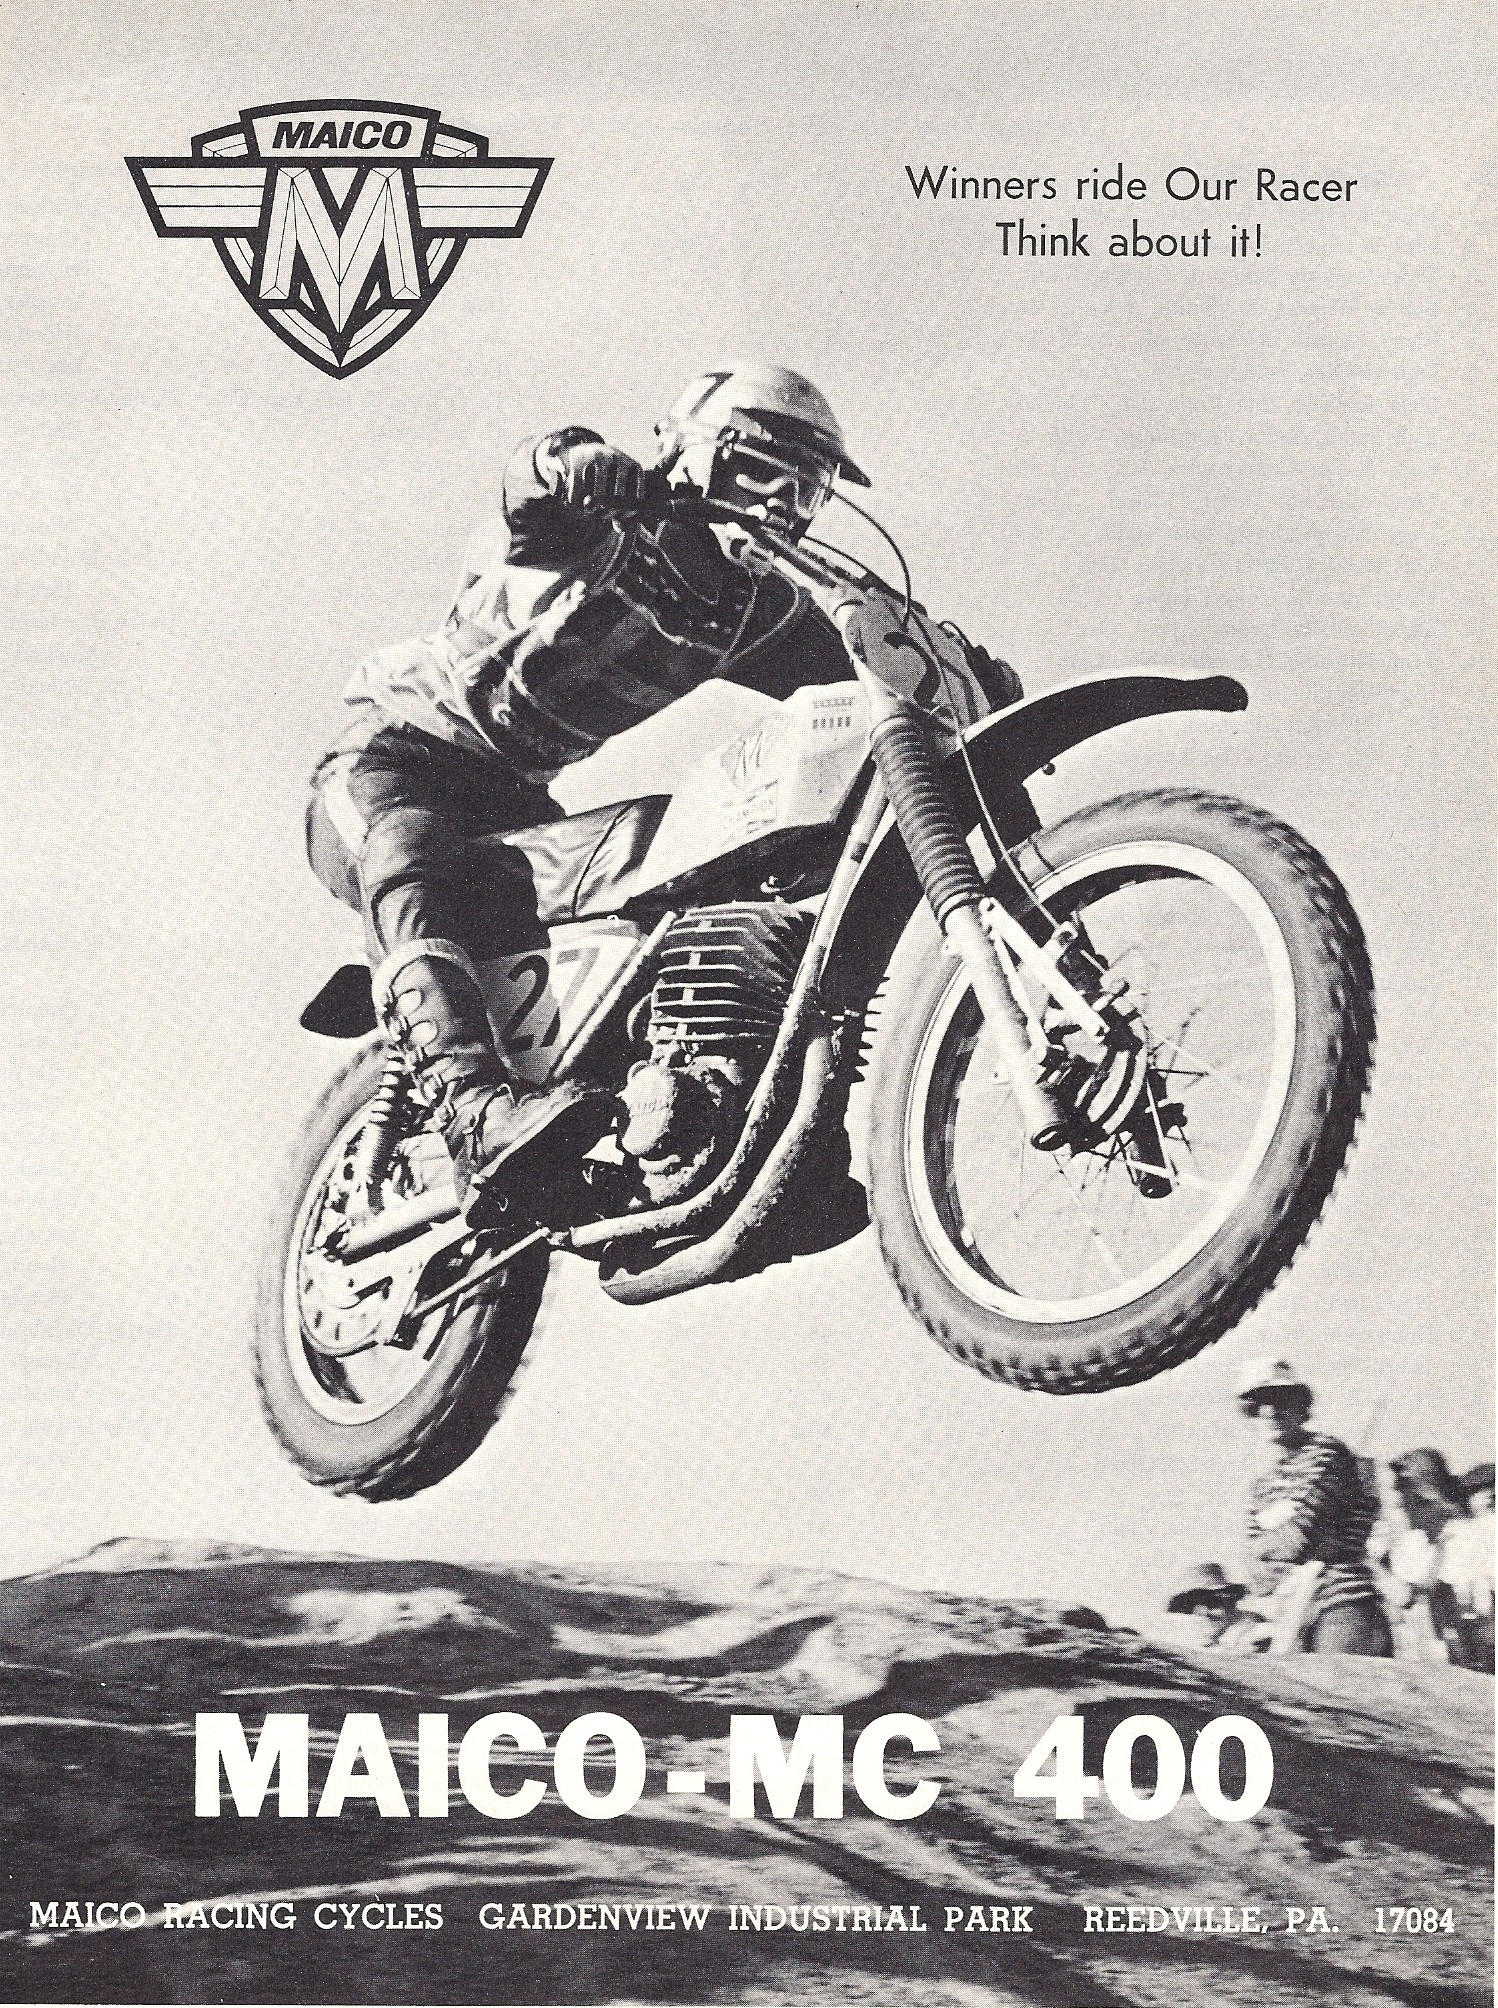 MAICO MC 400 advertisement